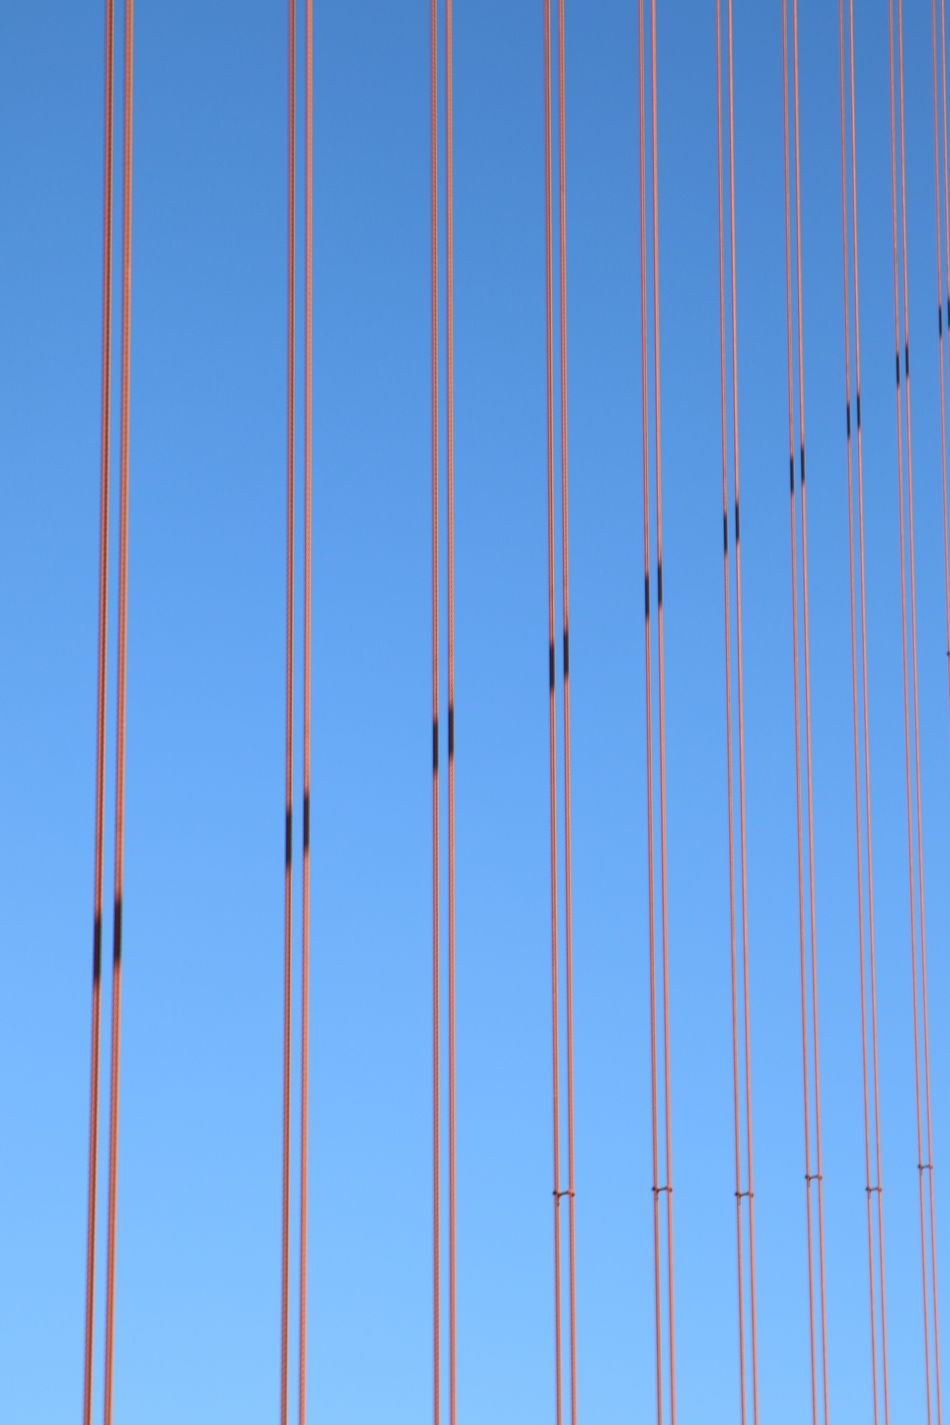 Architecture Blue Clear Sky Day Full Frame Geometric Shape Golden Gate Bridge Harp LINE No People San Francisco Shadows Sky Stability Steel Steel Strings Strings